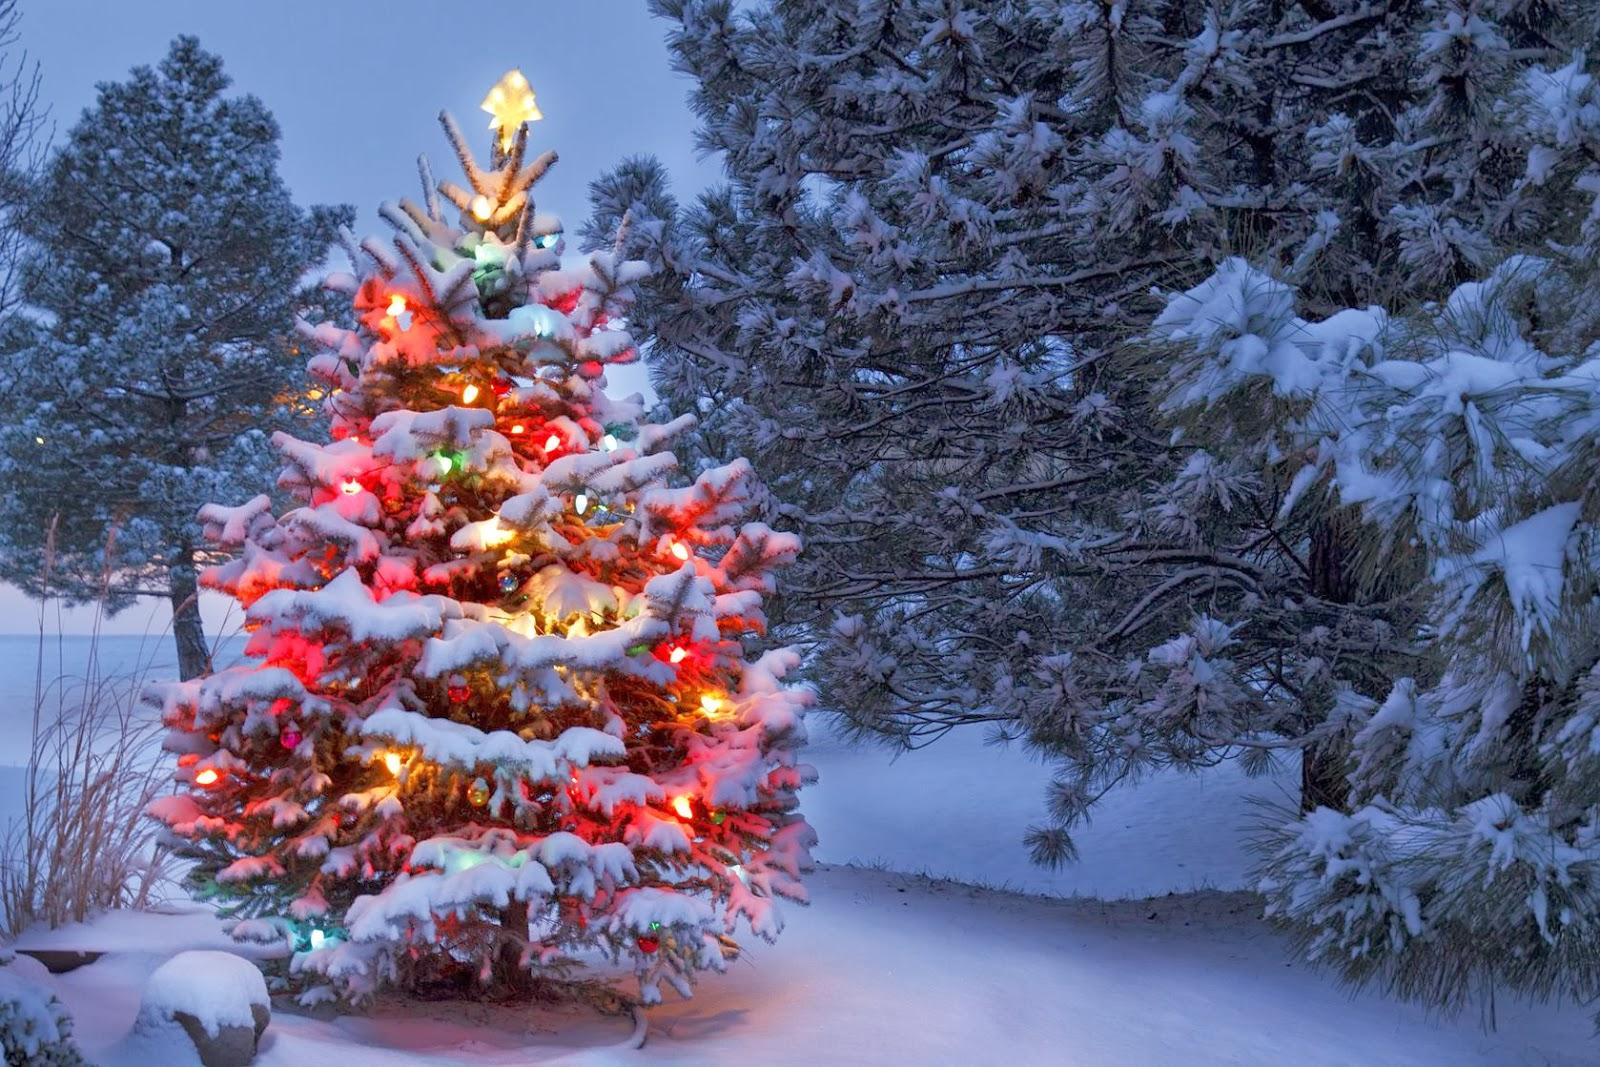 ♥★One day... PARADISE ★♥ - Página 39 Postales-navide%C3%B1as-con-arbolitos-o-pinitos-de-Navidad-Christmas-tree-+%2815%29